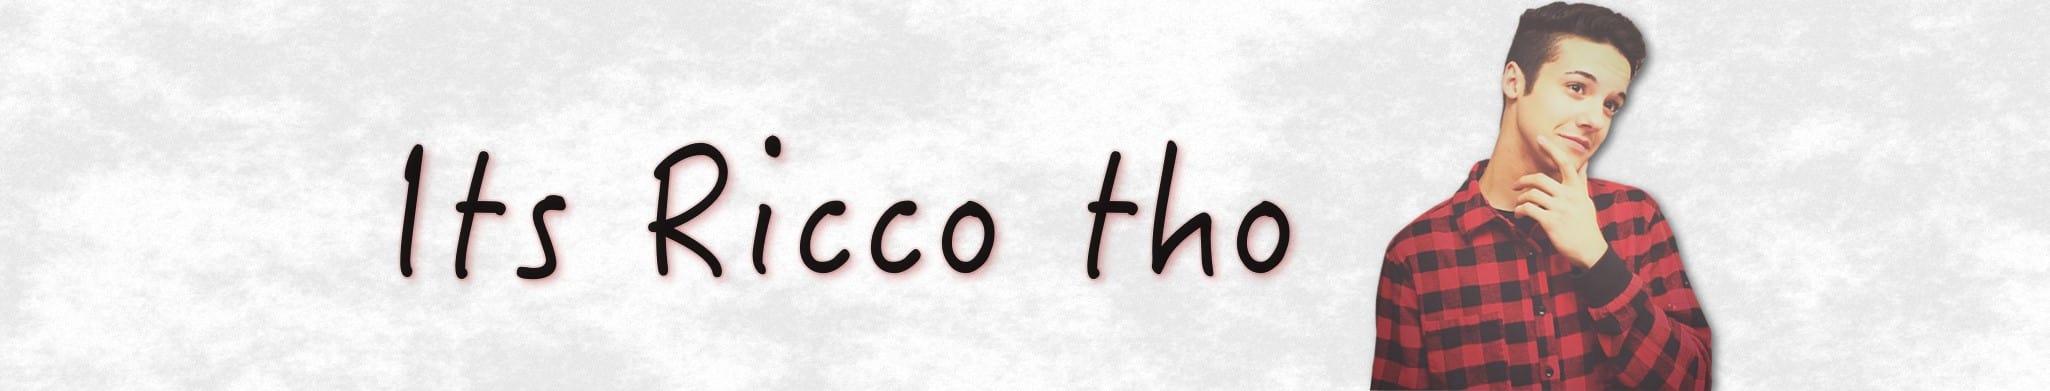 It's Ricco Tho Store